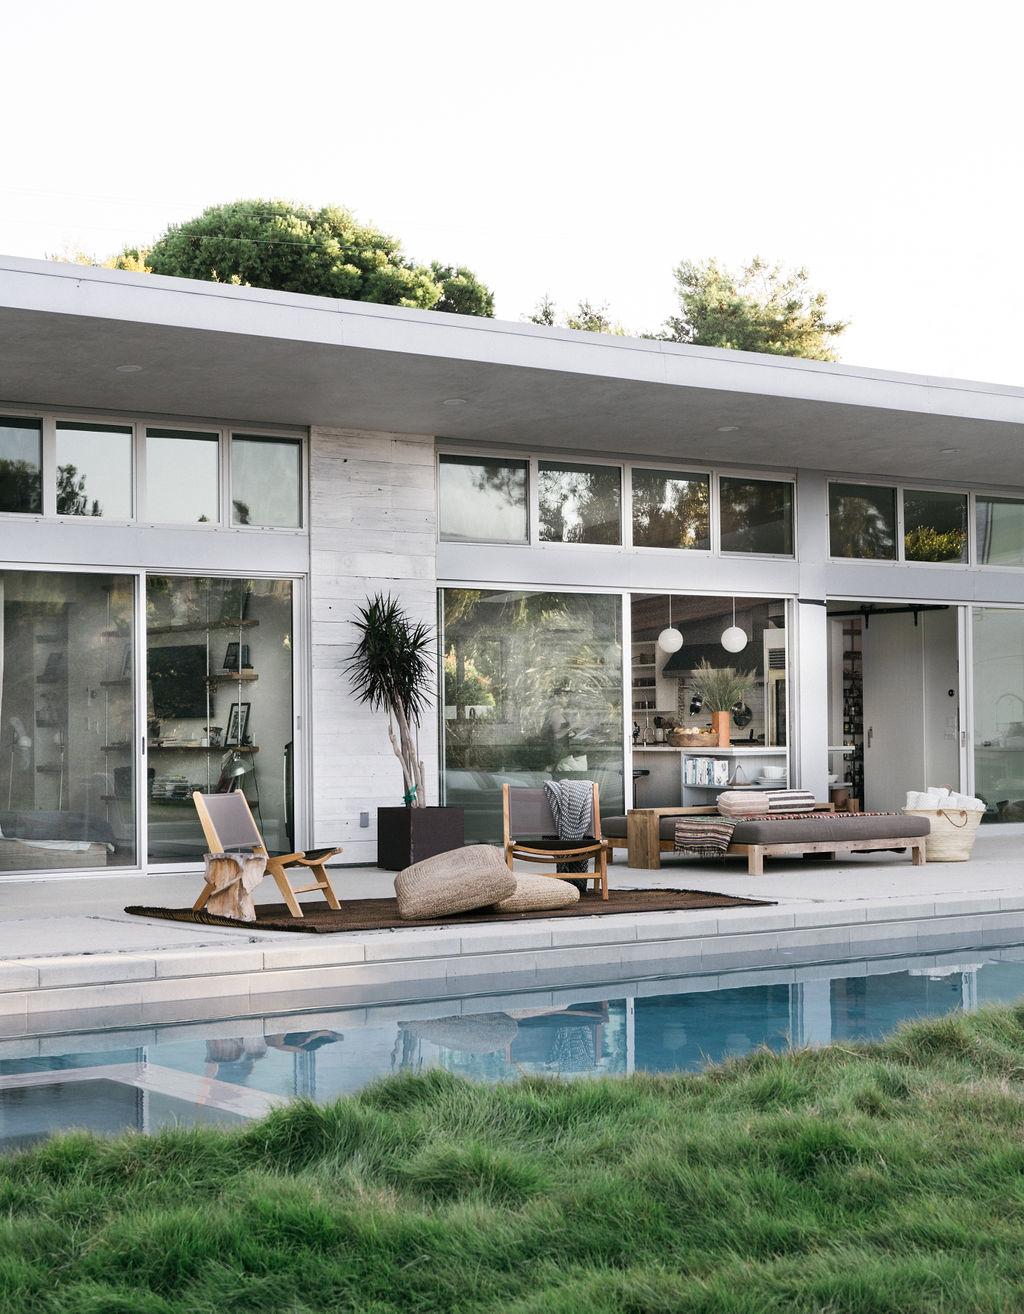 Malibu Farmhouse by Burdge & Associates Architects. Pool & modern farmhouse design.